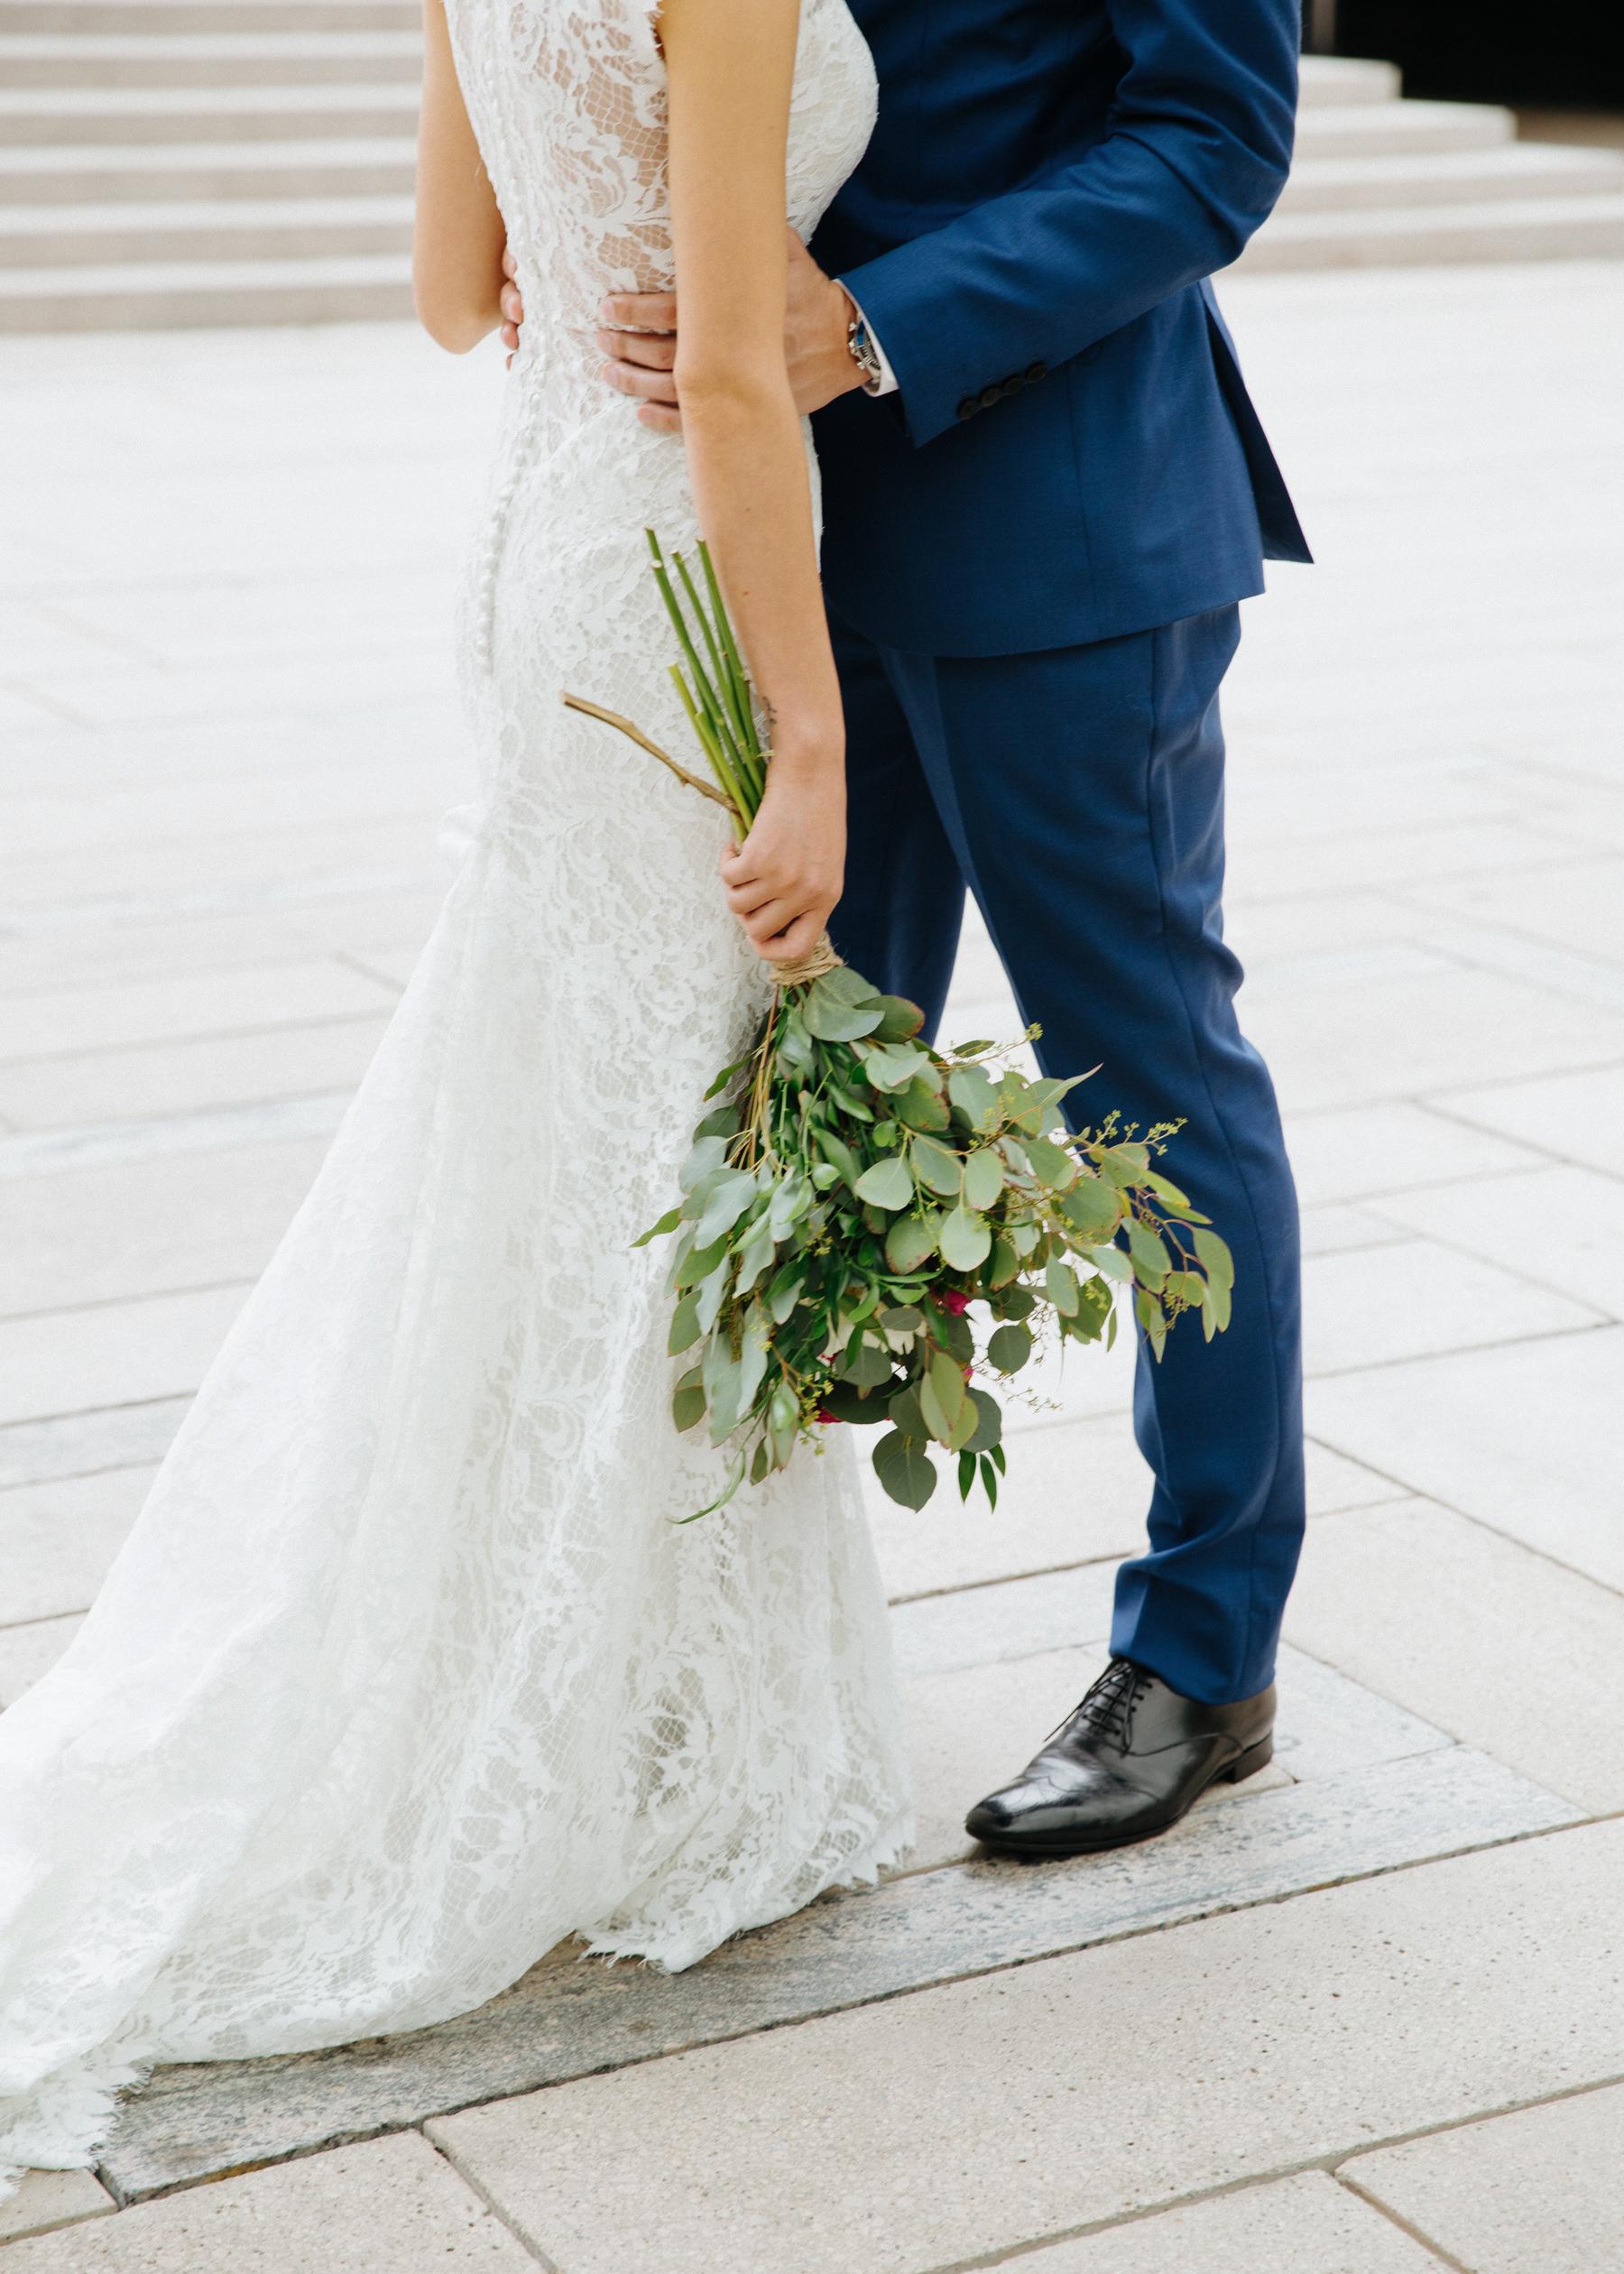 kaoverii_silva_photographer_via-herafilms_kieu_kaz_wedding-21.jpg